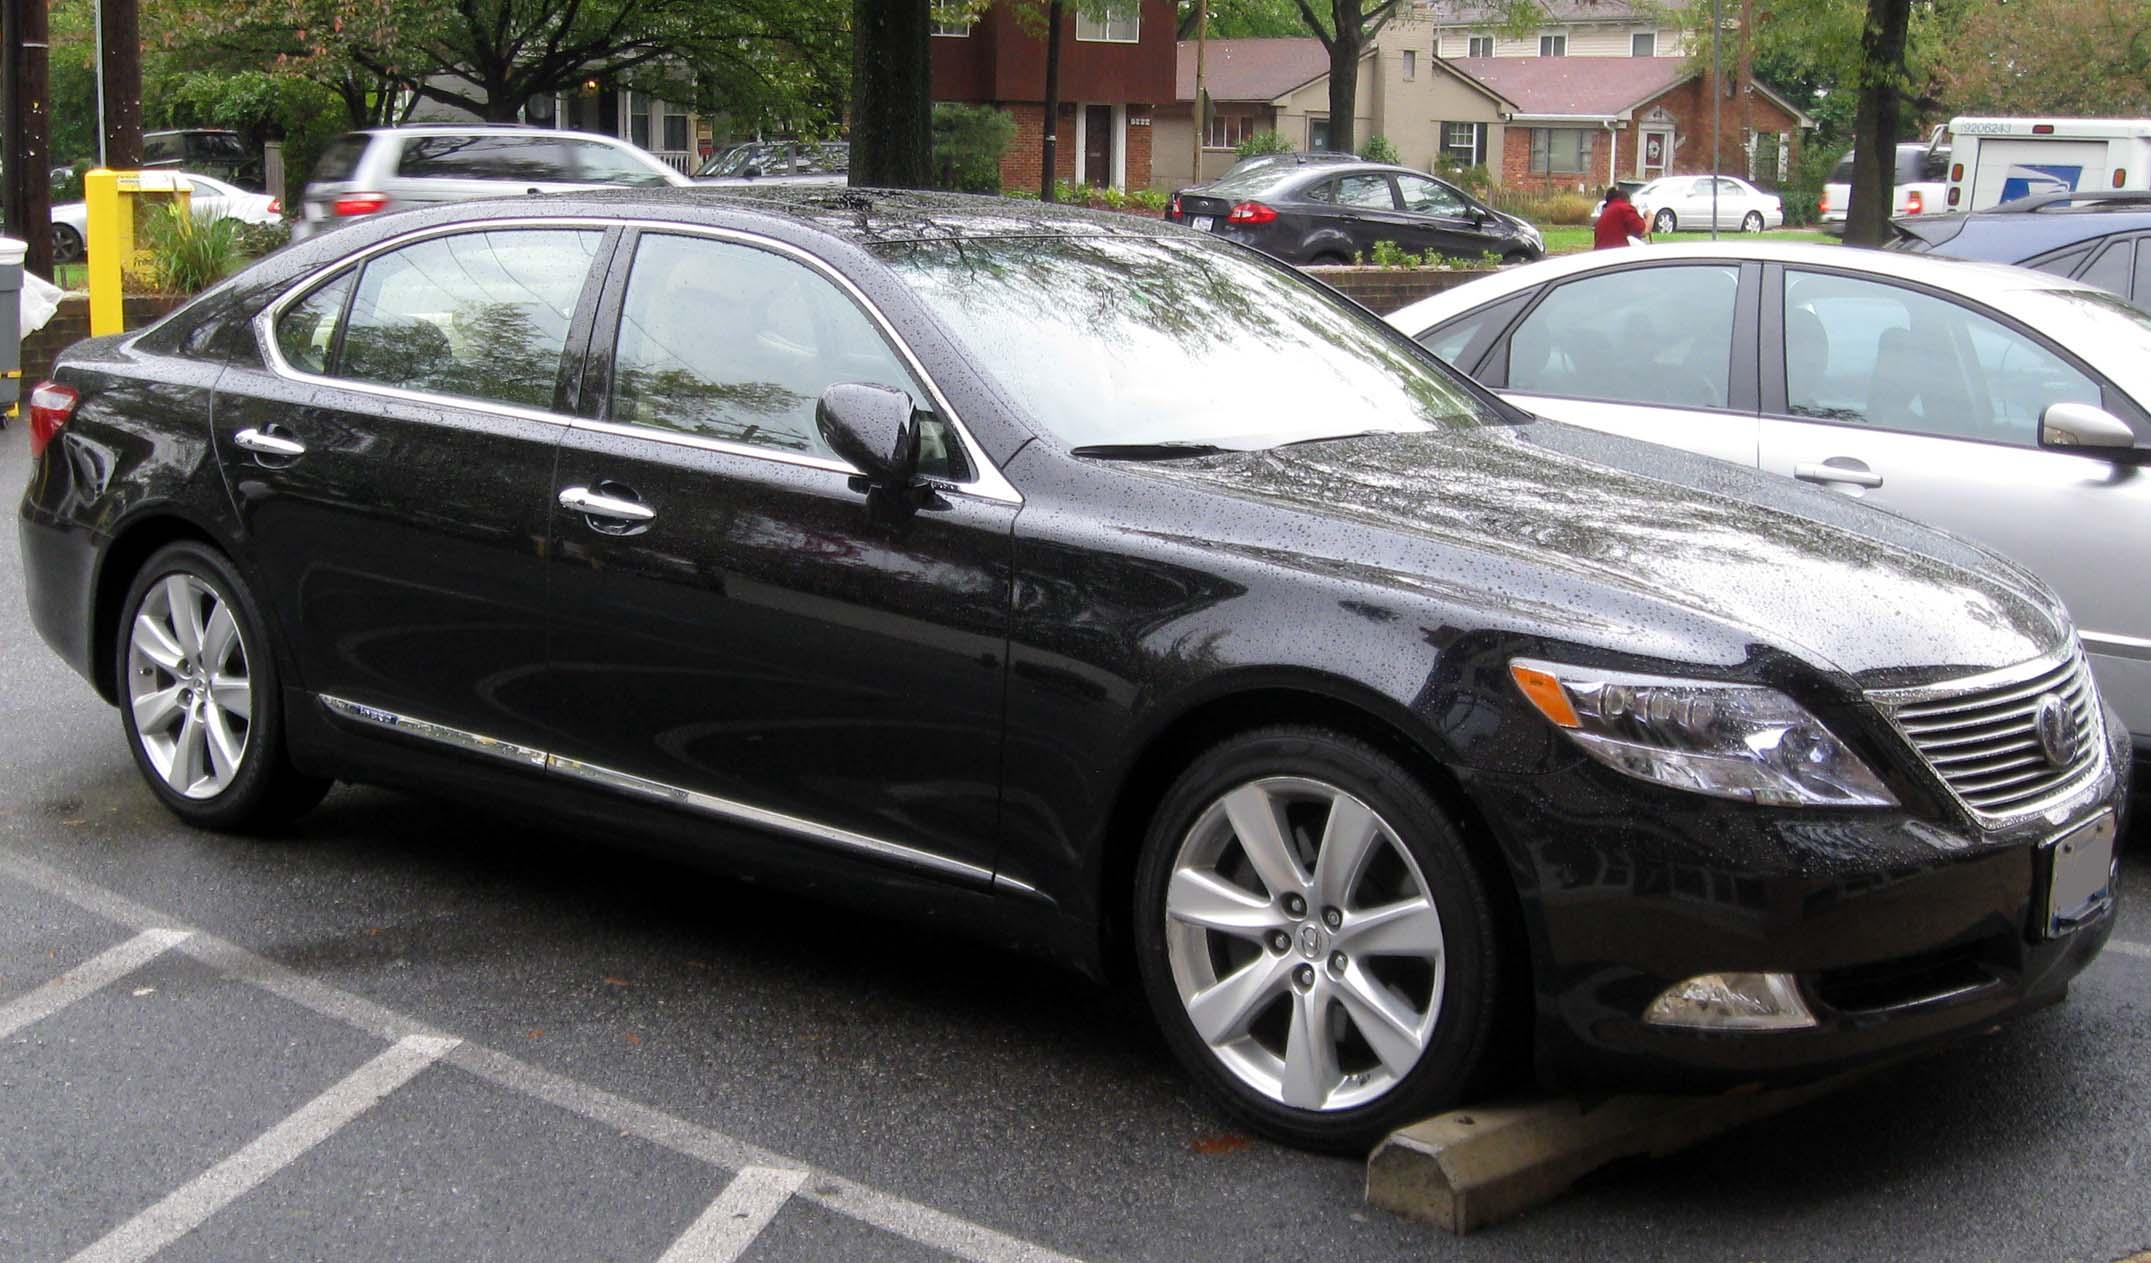 https://upload.wikimedia.org/wikipedia/commons/7/77/2007-2009_Lexus_LS600h_--_10-27-2011.jpg